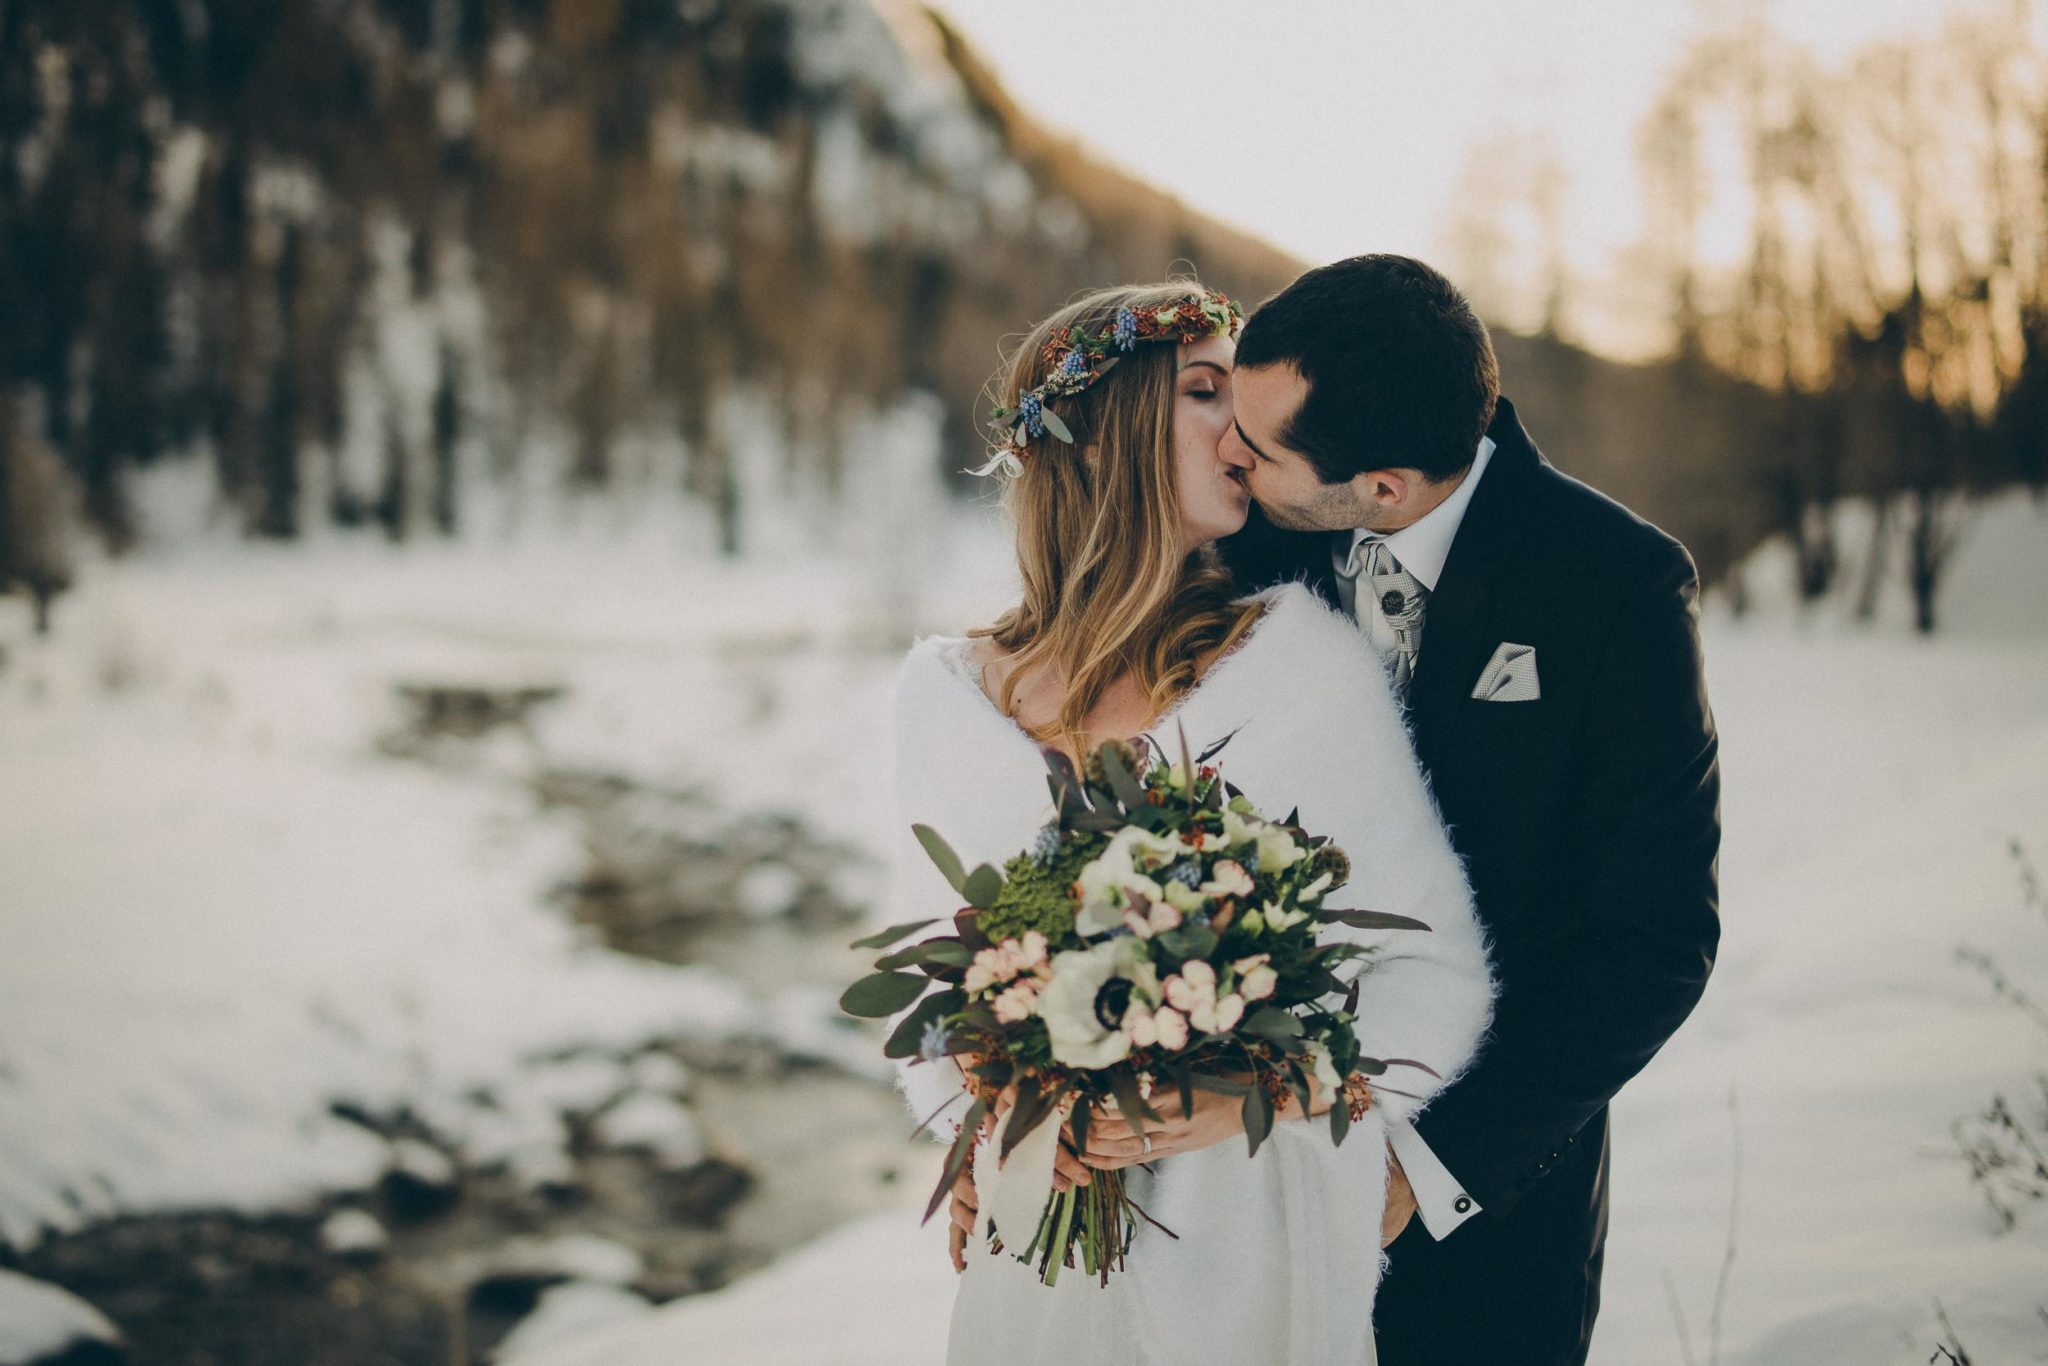 Les Photos De Couple Hors Mariage